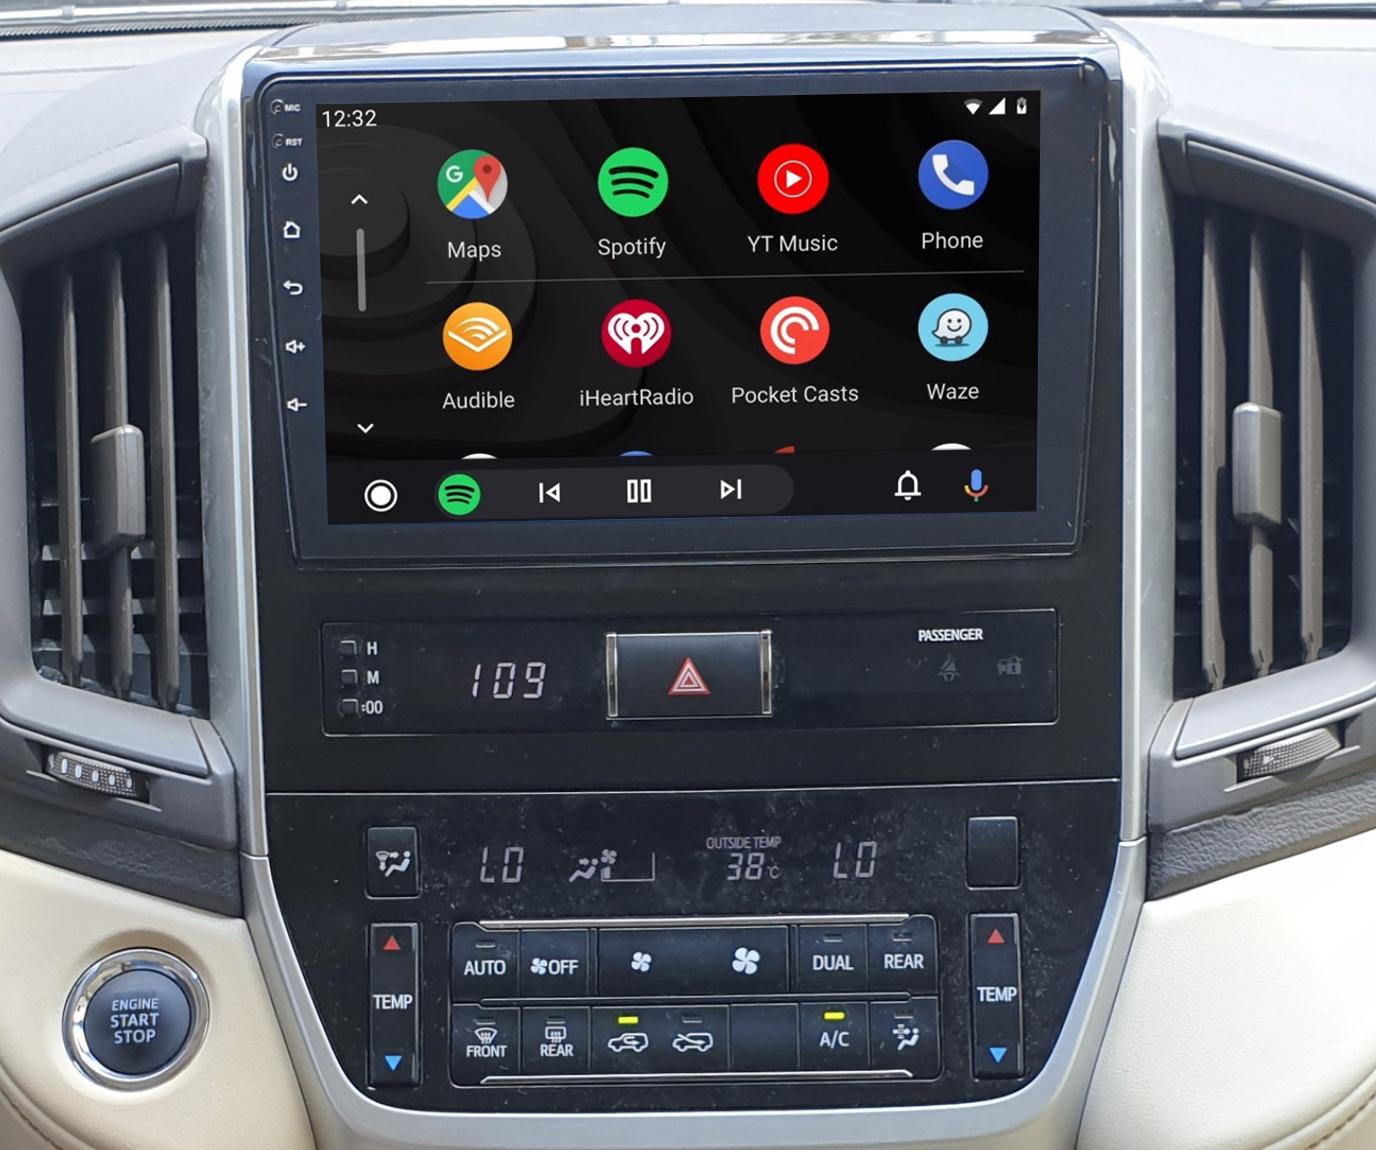 Ecran tactile QLED Android 11.0 + Apple Carplay sans fil Toyota Land Cruiser depuis 2016